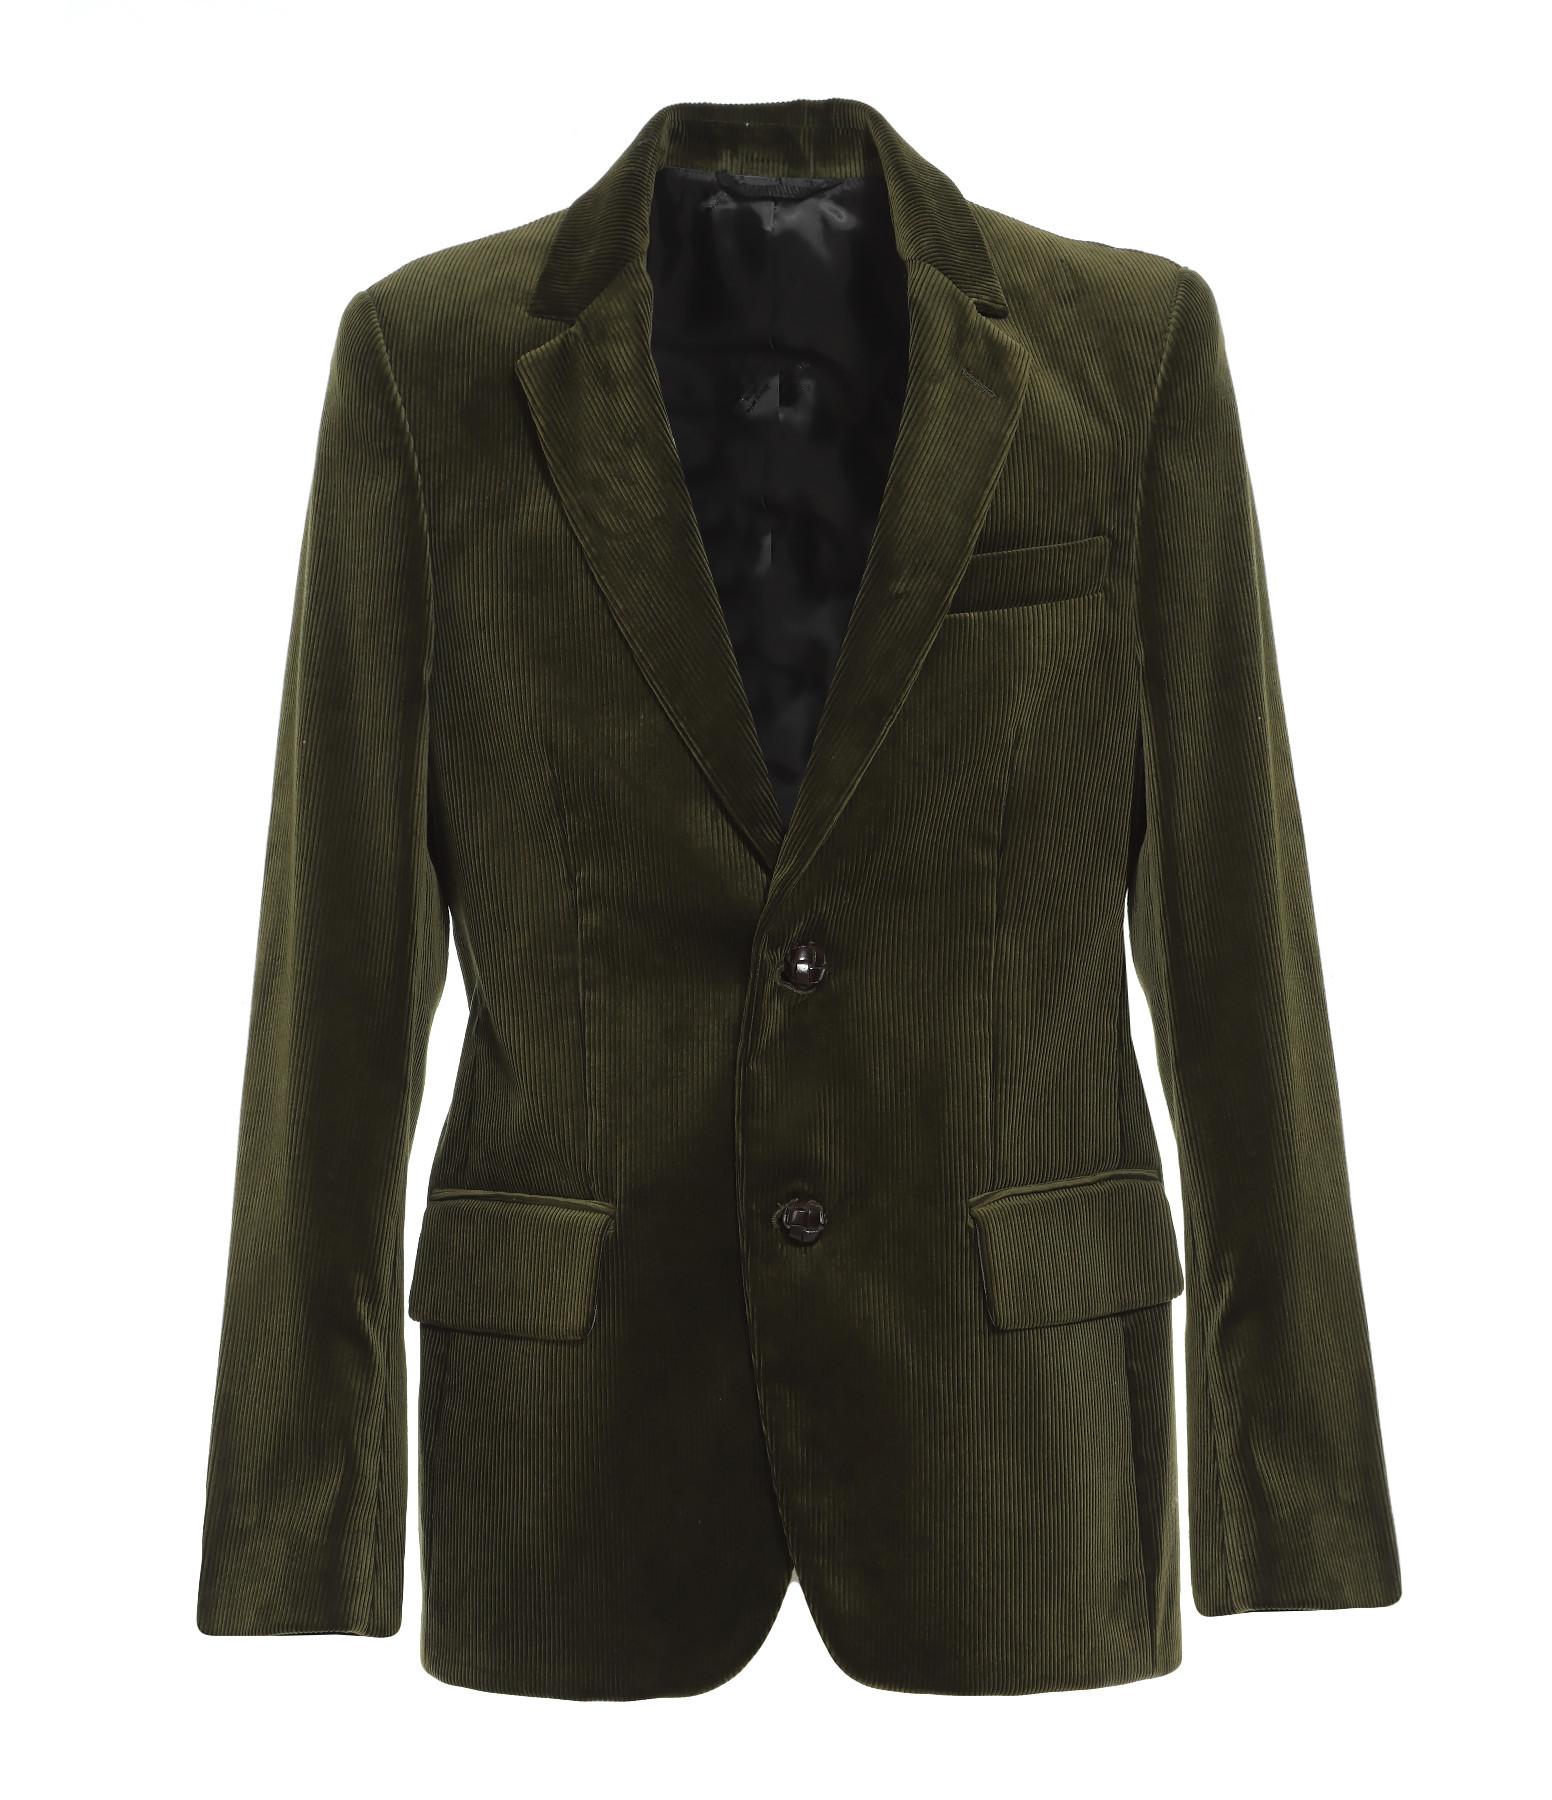 GOLDEN GOOSE - Blazer Homme Velours Côtelé Vert